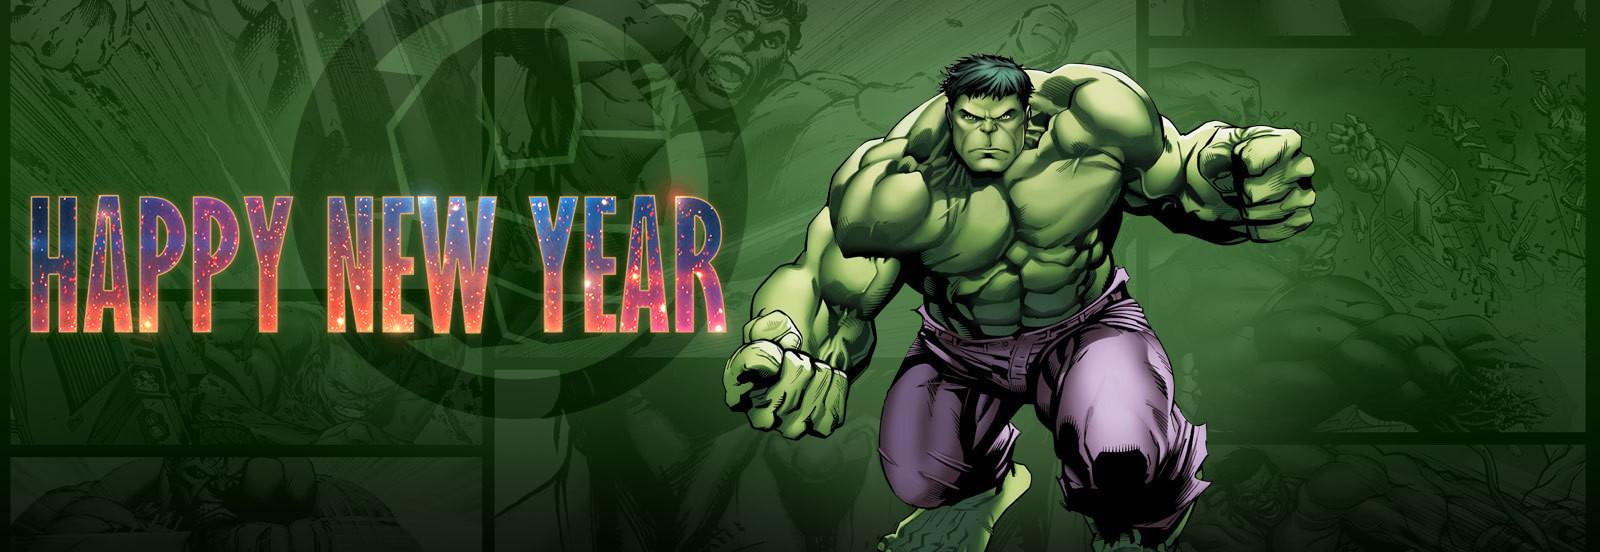 Happy New Year Greetings Wishes Super Hero Hulk Kids Hd Wallpaper